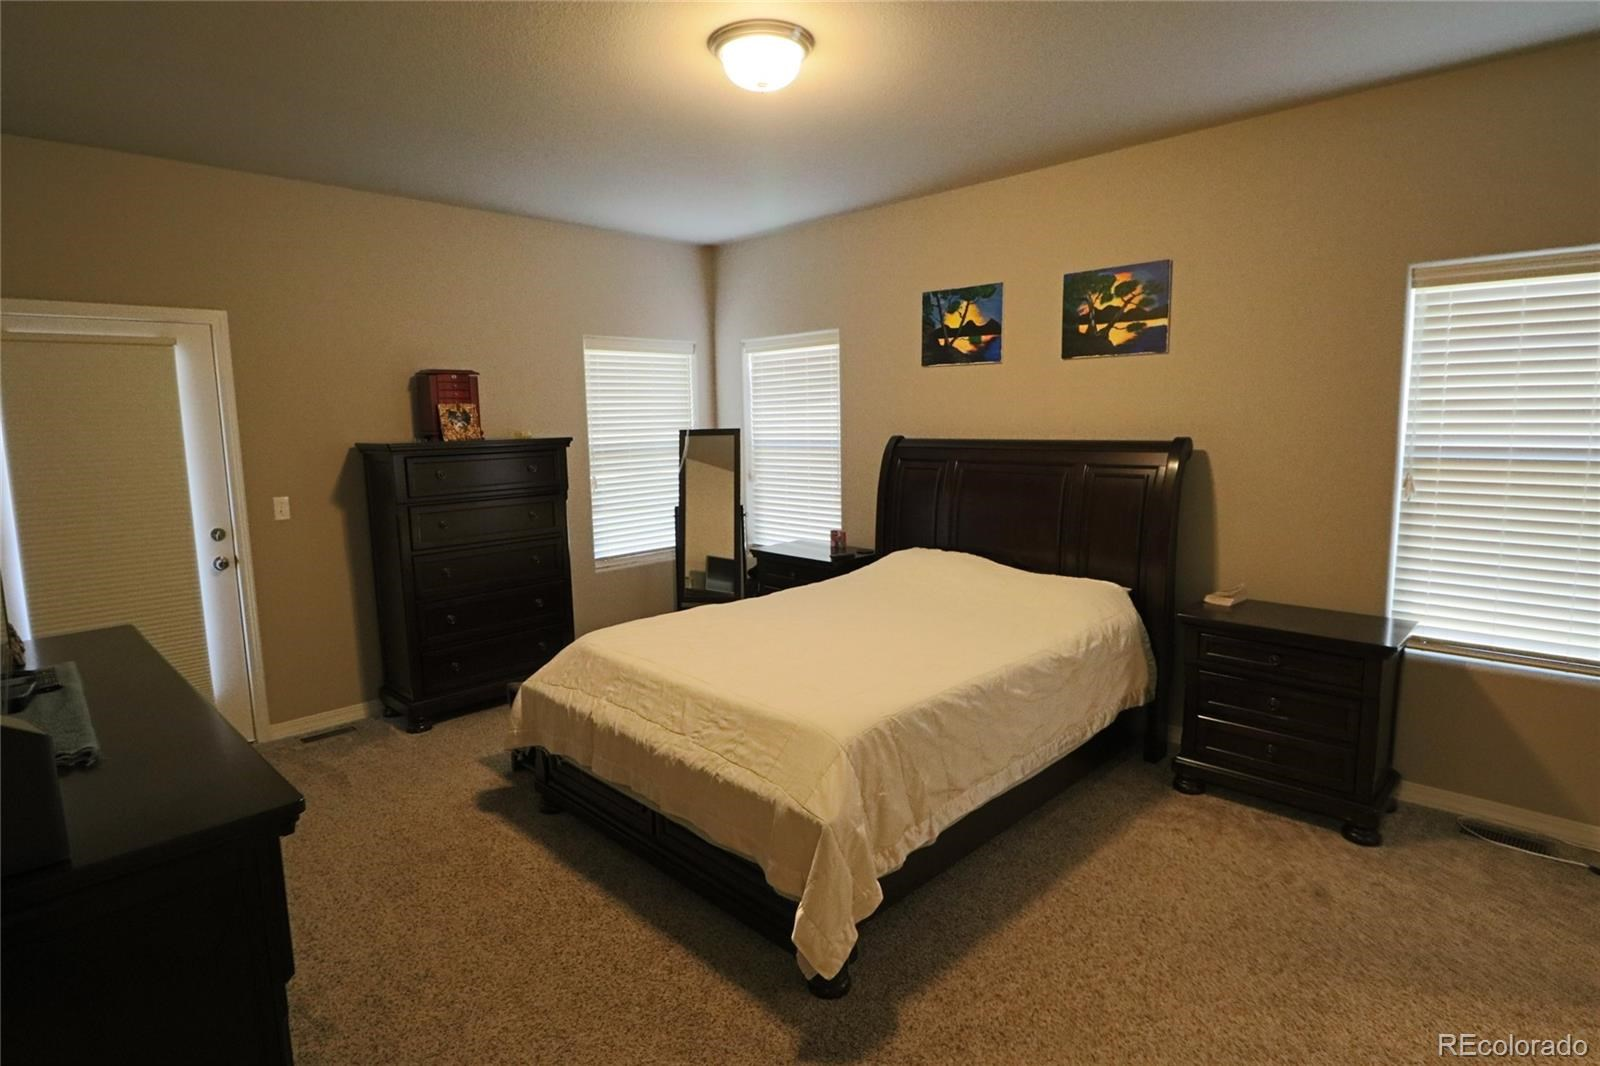 MLS# 4464685 - 14 - 10827 Hidden Prairie Parkway, Fountain, CO 80817